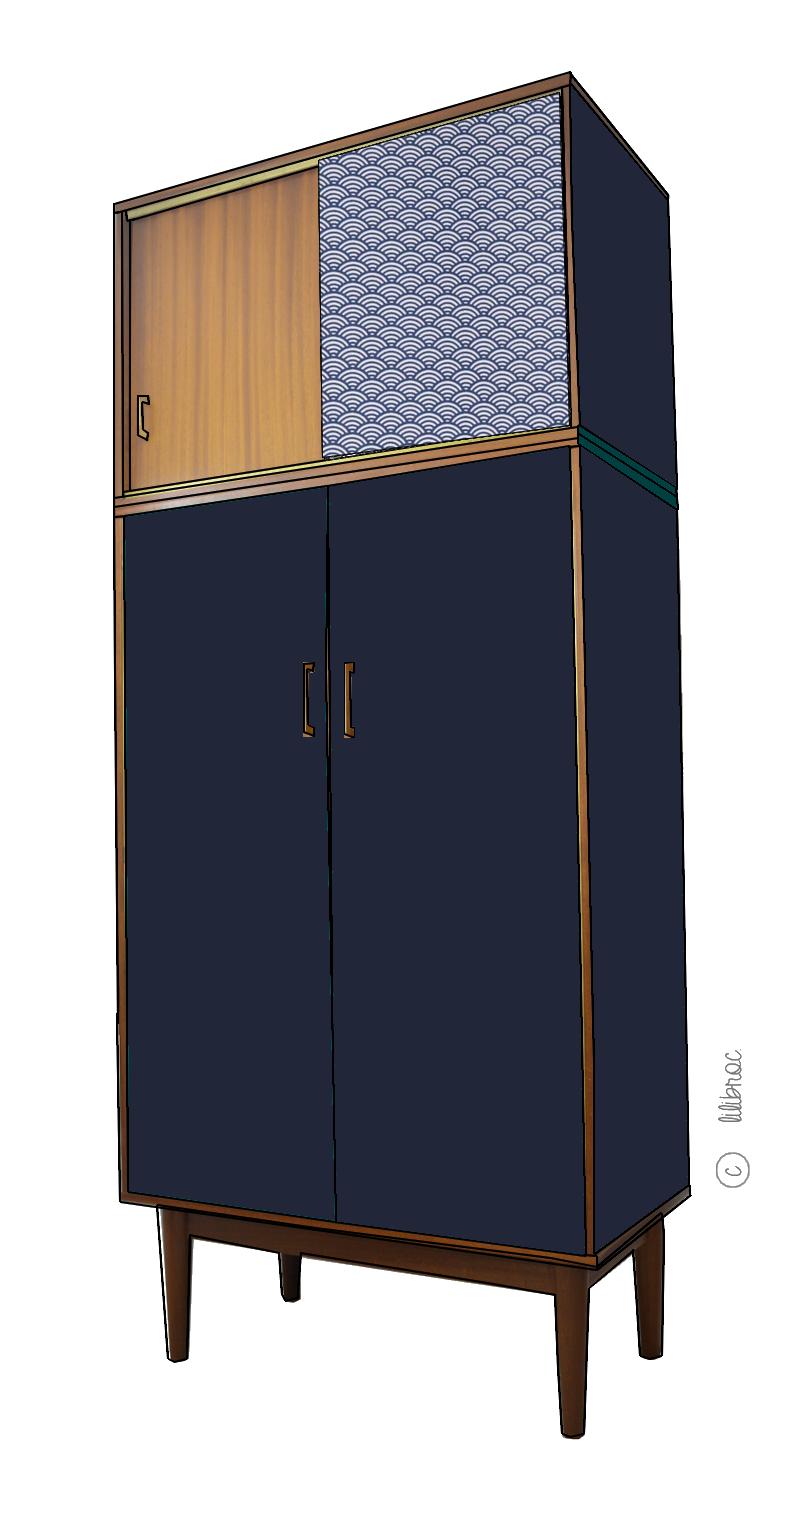 armoire-vintage-philomene-croquis-5